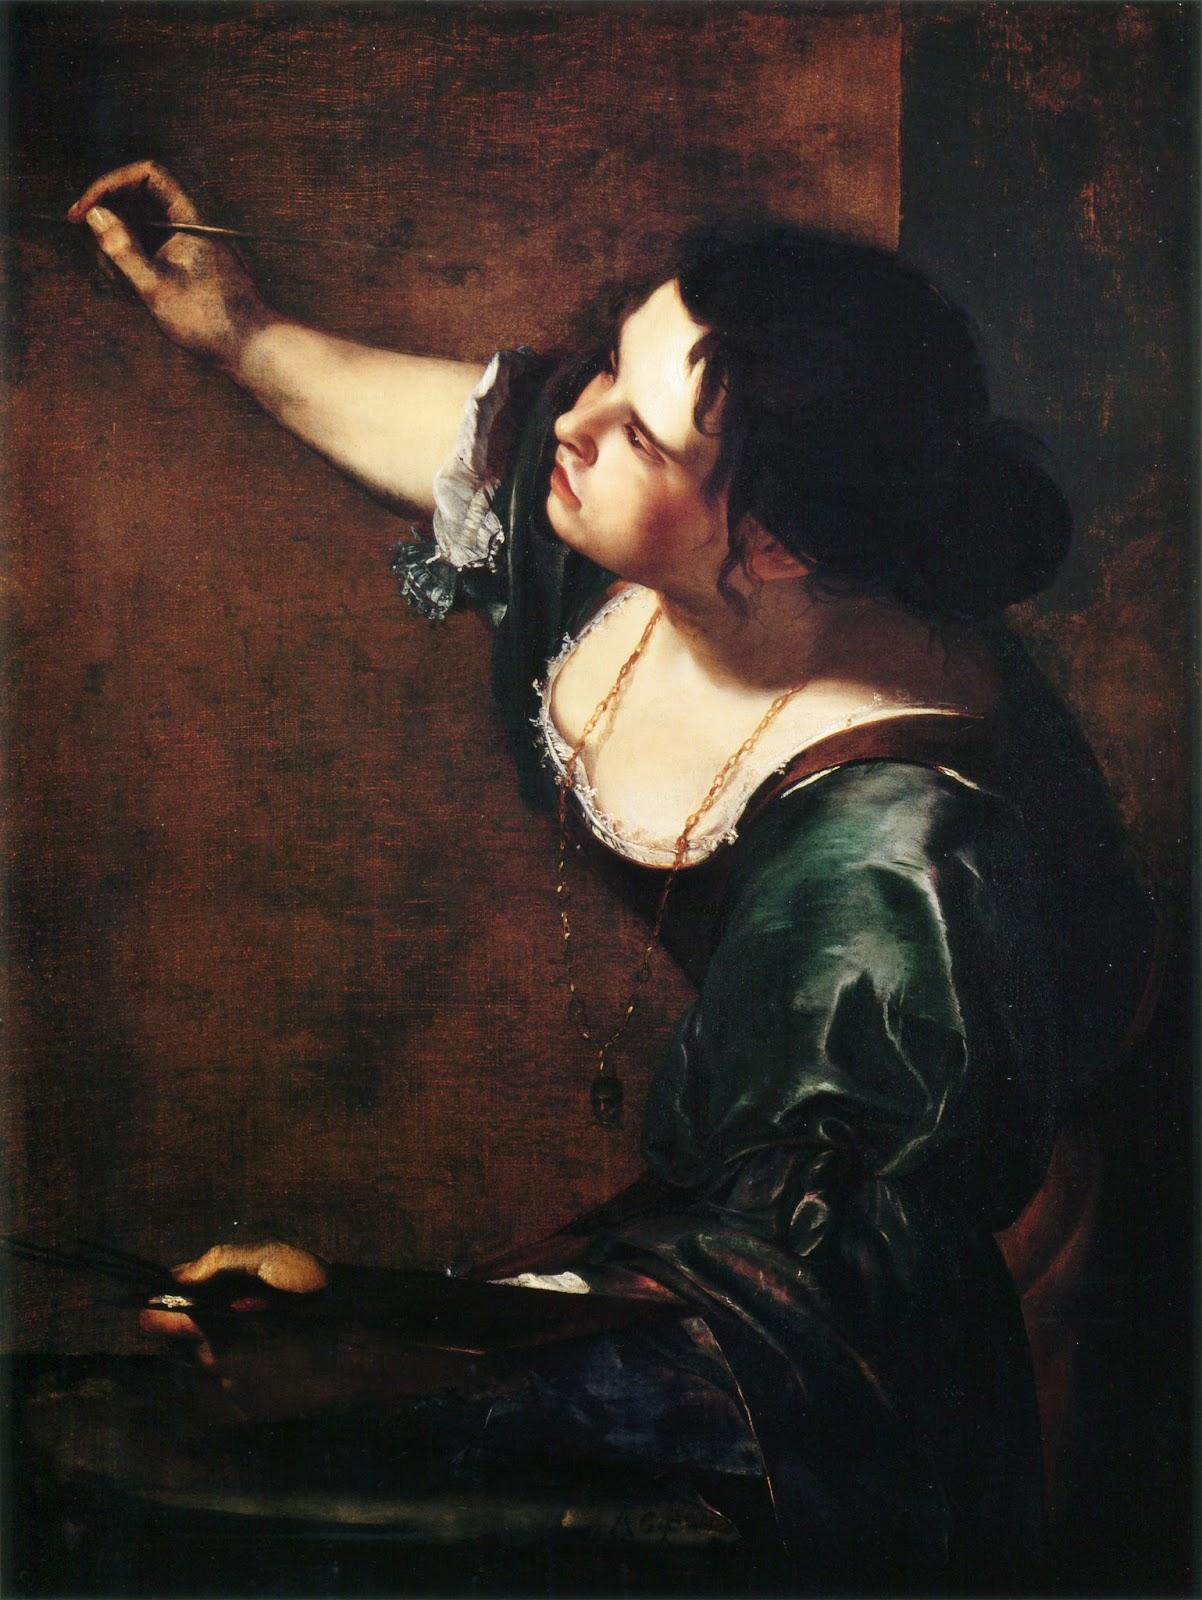 AUto retrato Alegoria pintura Artemisia Gentileschi - Artemisia Gentileschi - os pintores caravaggescos